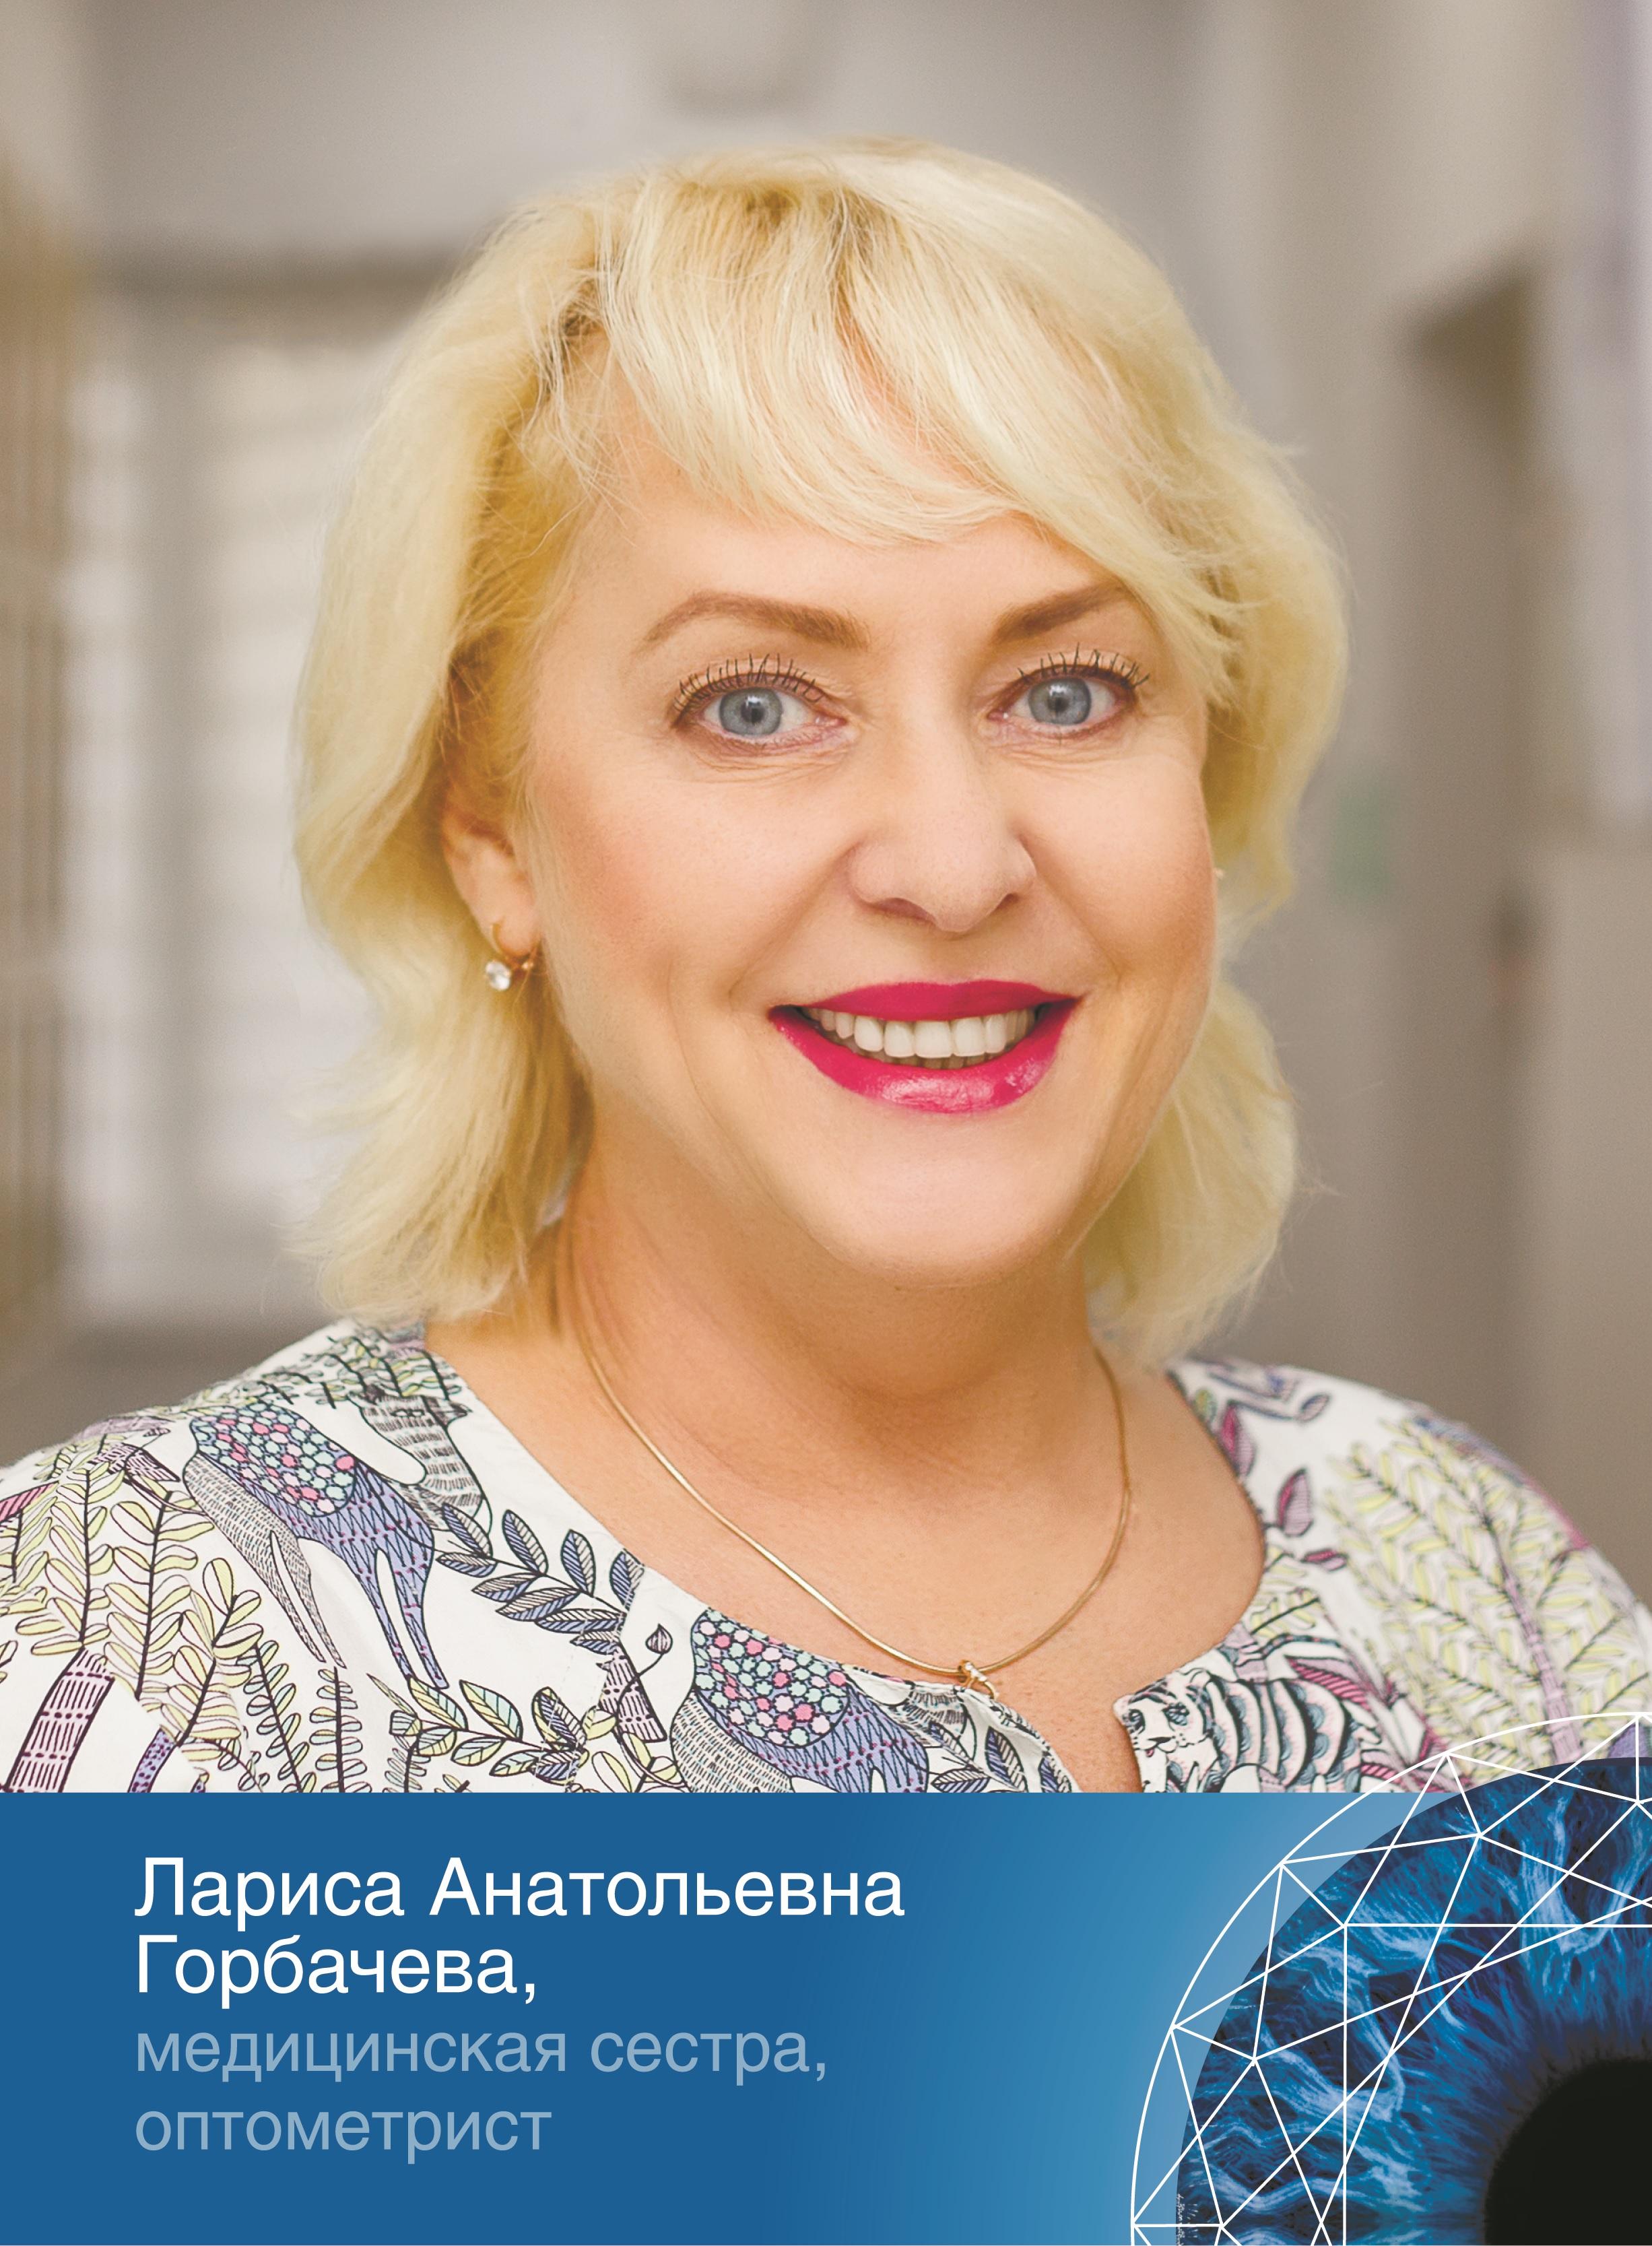 Горбачева Лариса Анатольевна